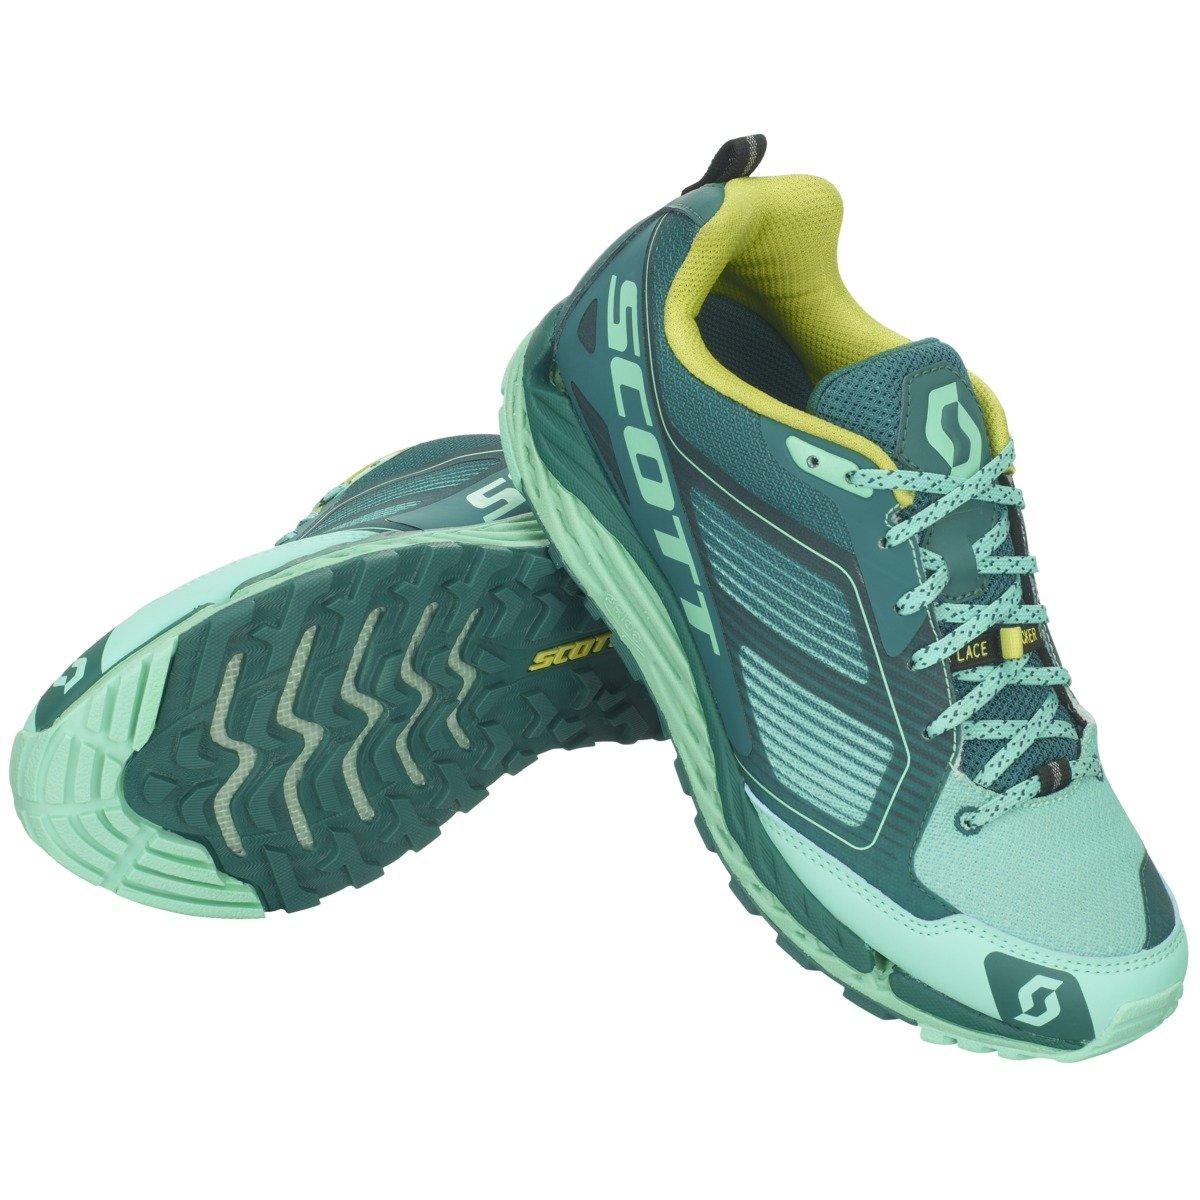 Scott 5,5 Damen Laufschuhe W's T2 Kinabalu 3.0 ROT 5,5 Scott green 7cafad